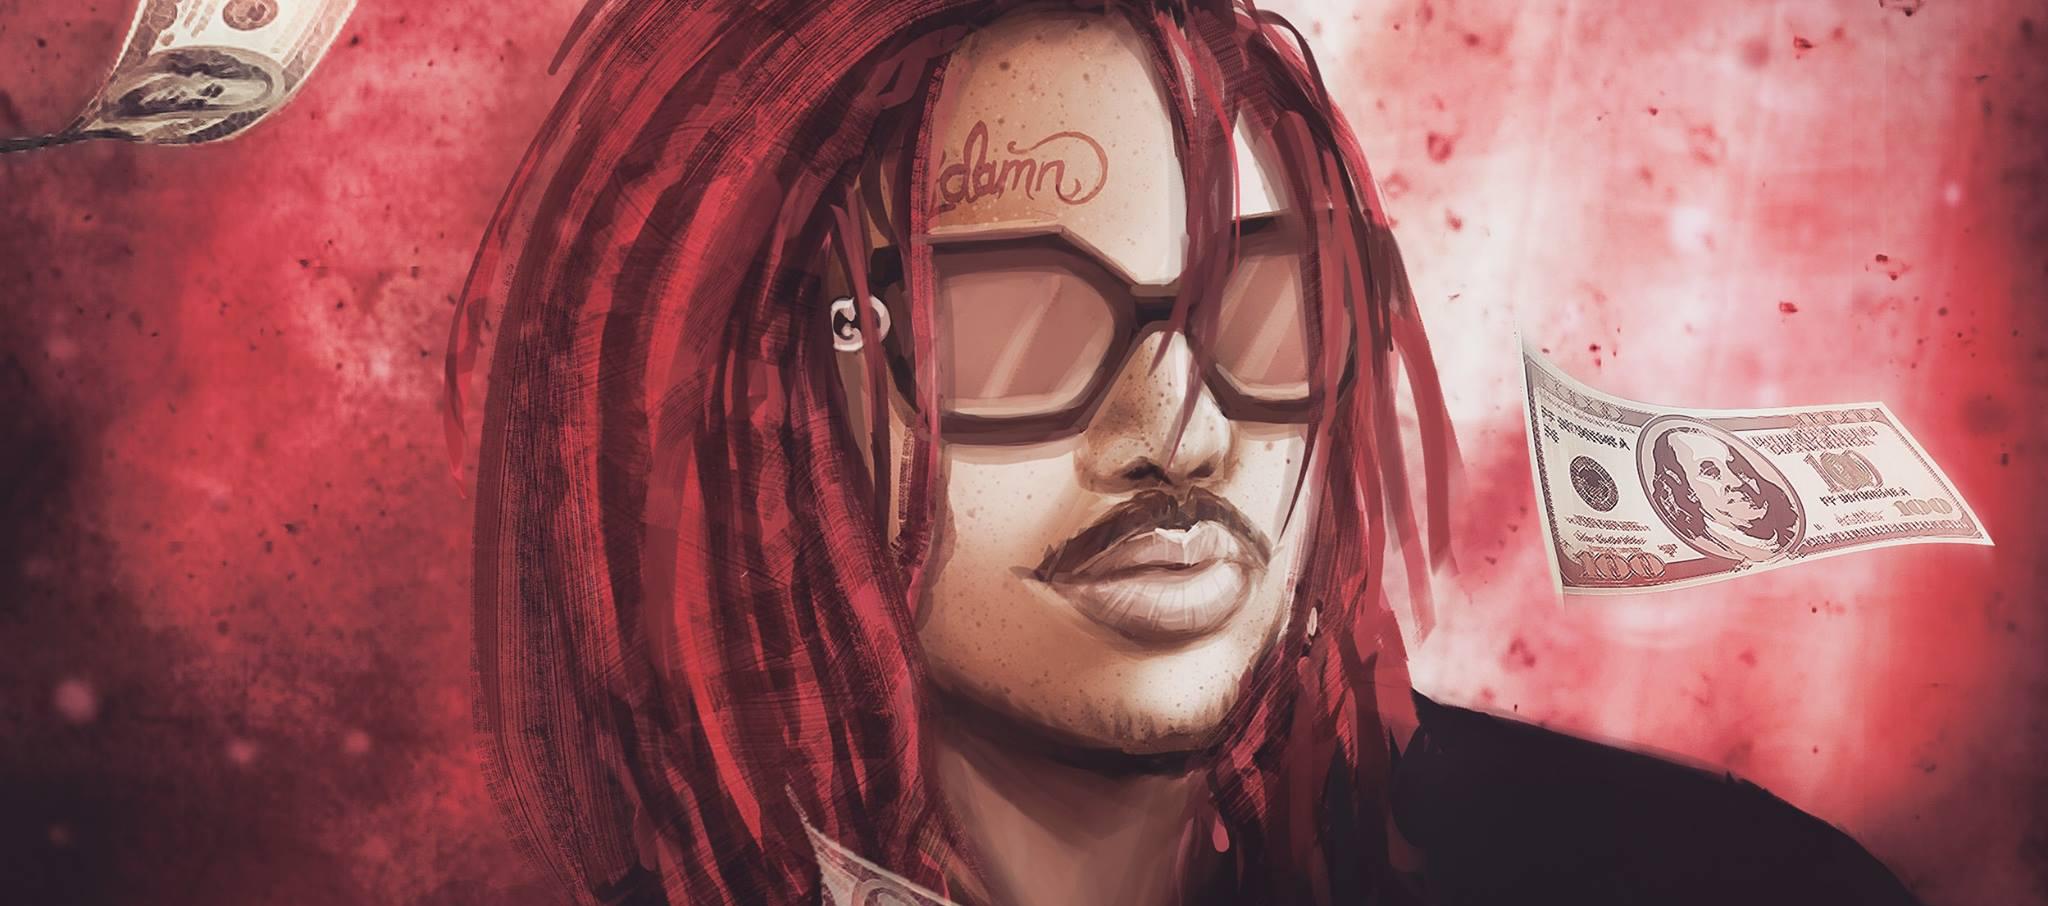 Adamn Killa, poison rose bonbon